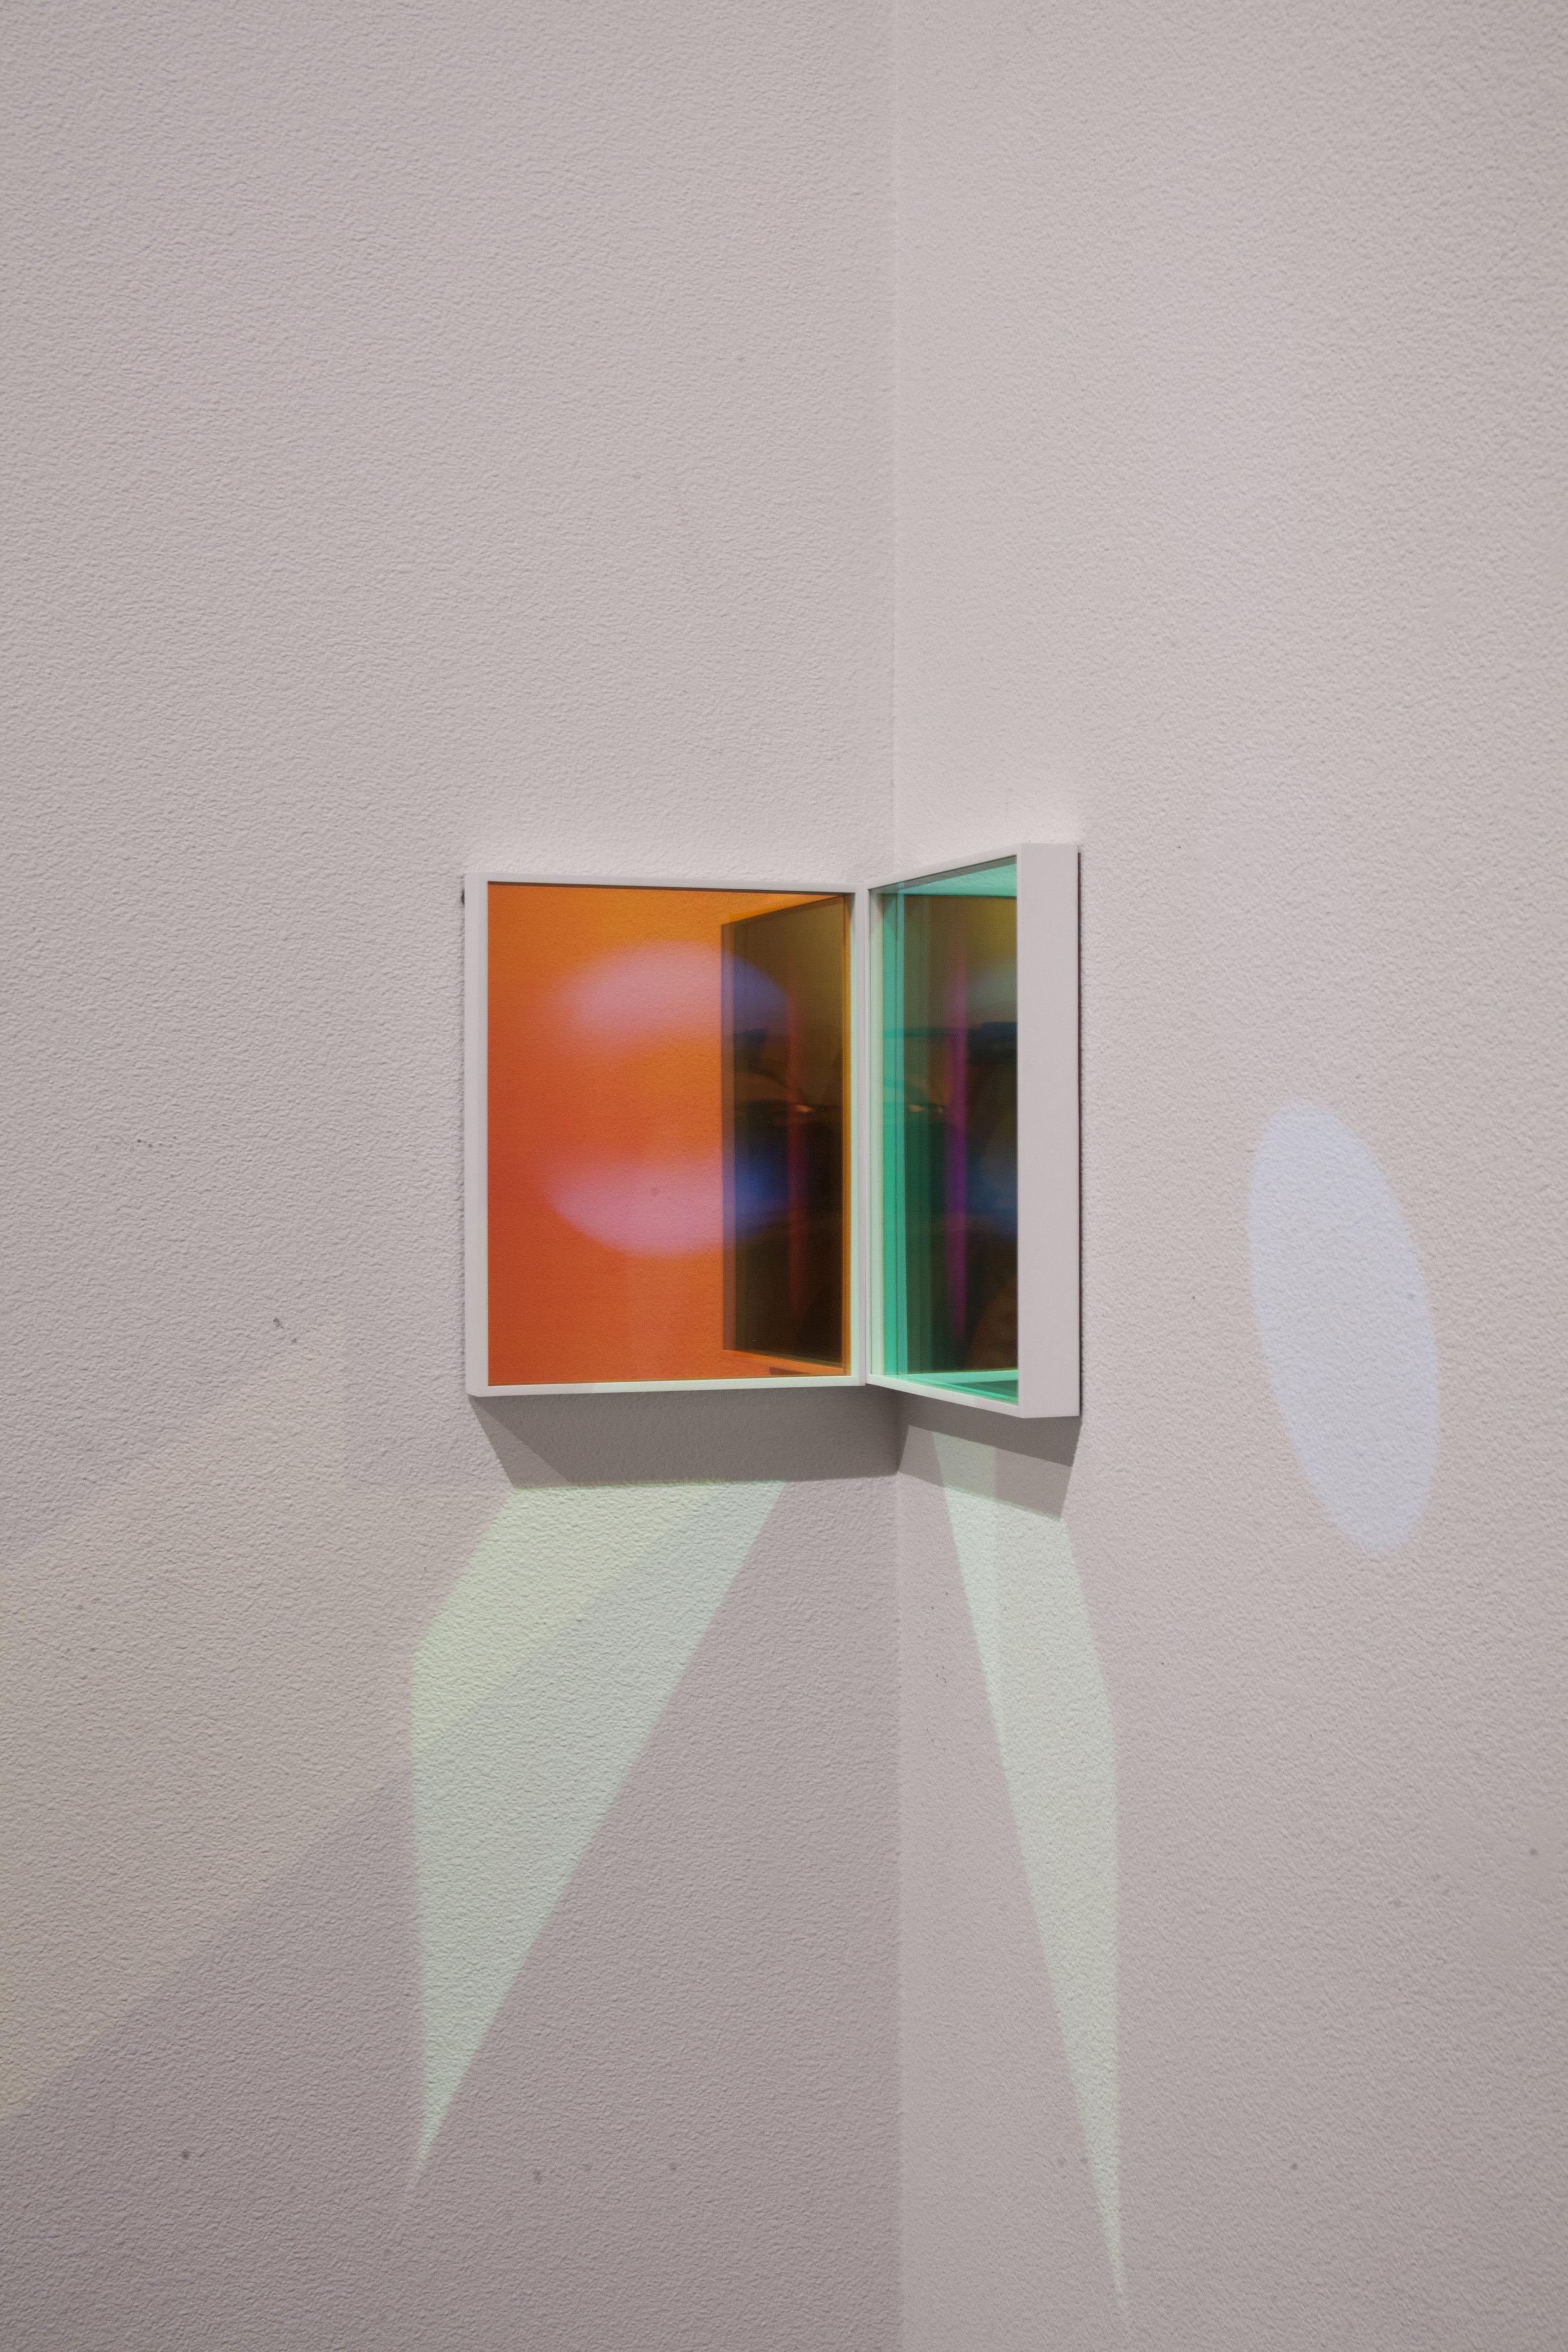 Reflection - Bakersfield College - W/ Josh Schaedel